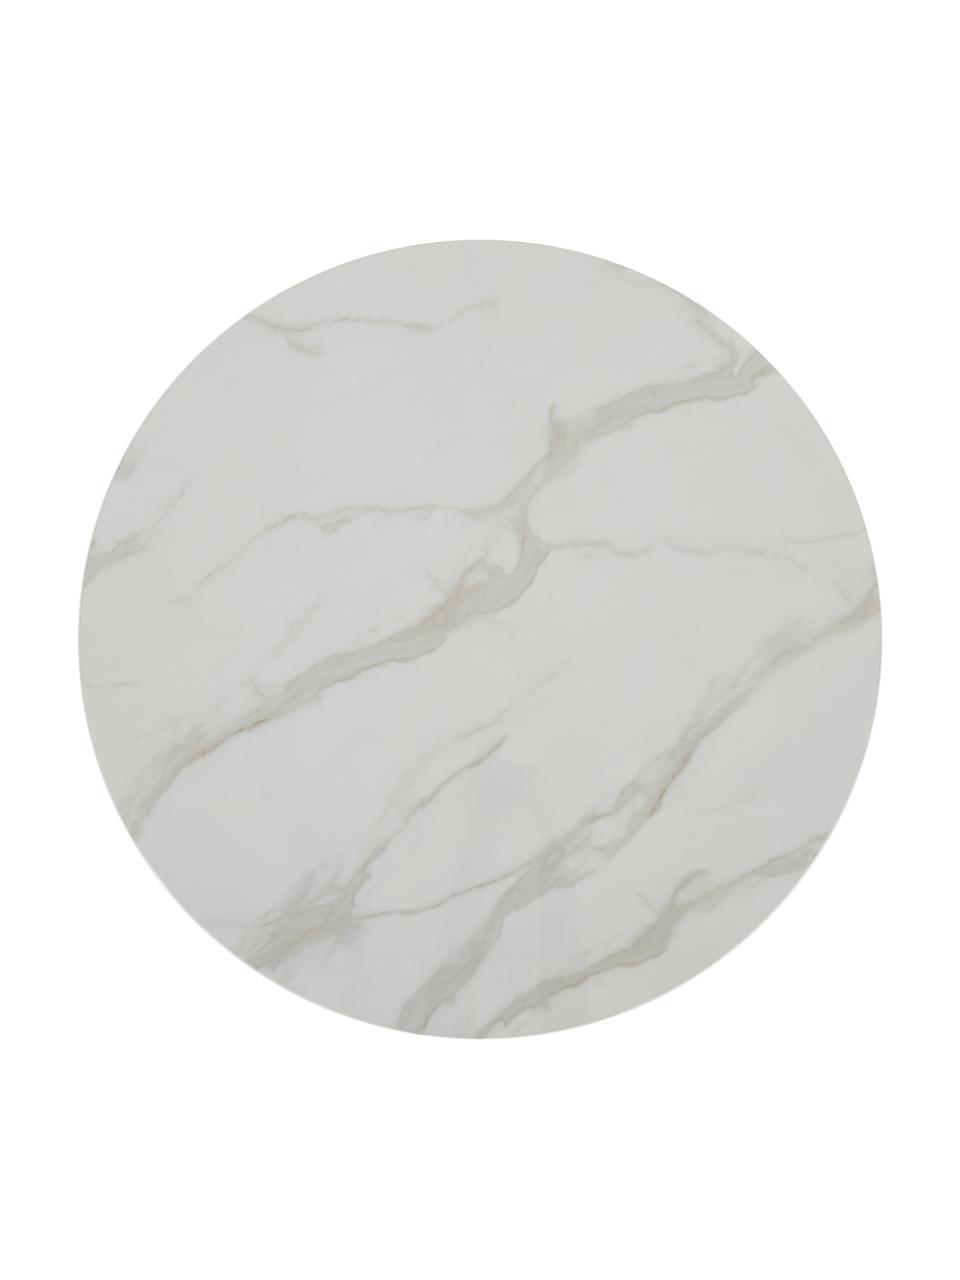 Table ronde blanche dorée Karla, Blanc marbré